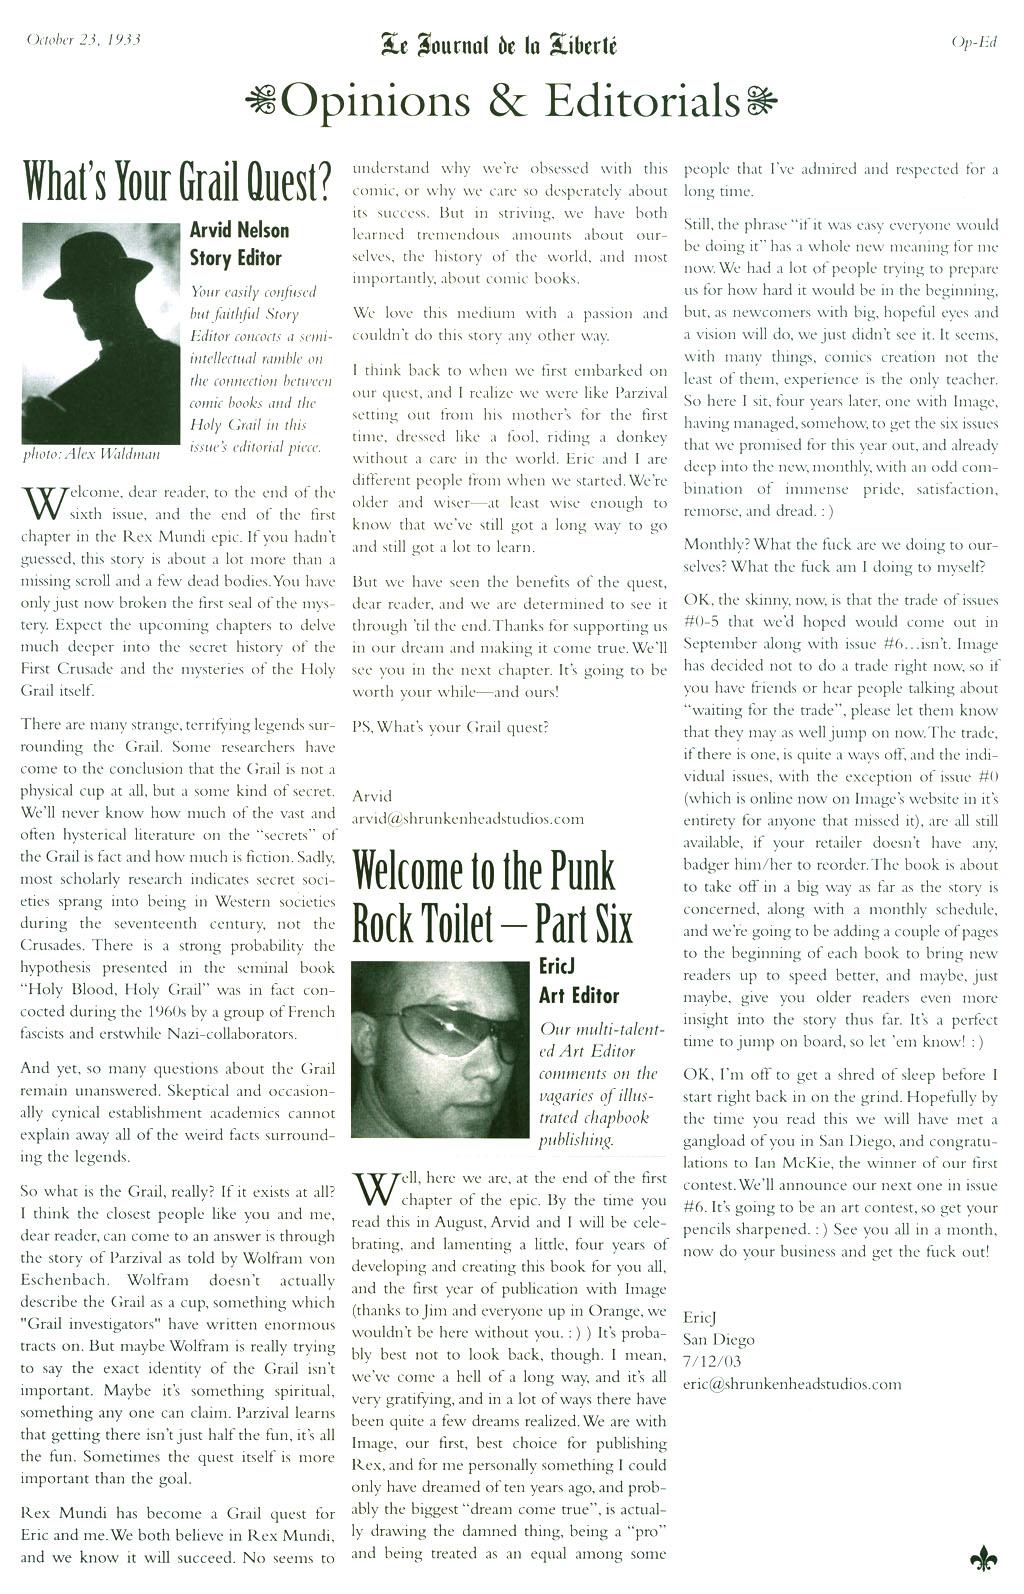 Read online Rex Mundi comic -  Issue #5 - 27